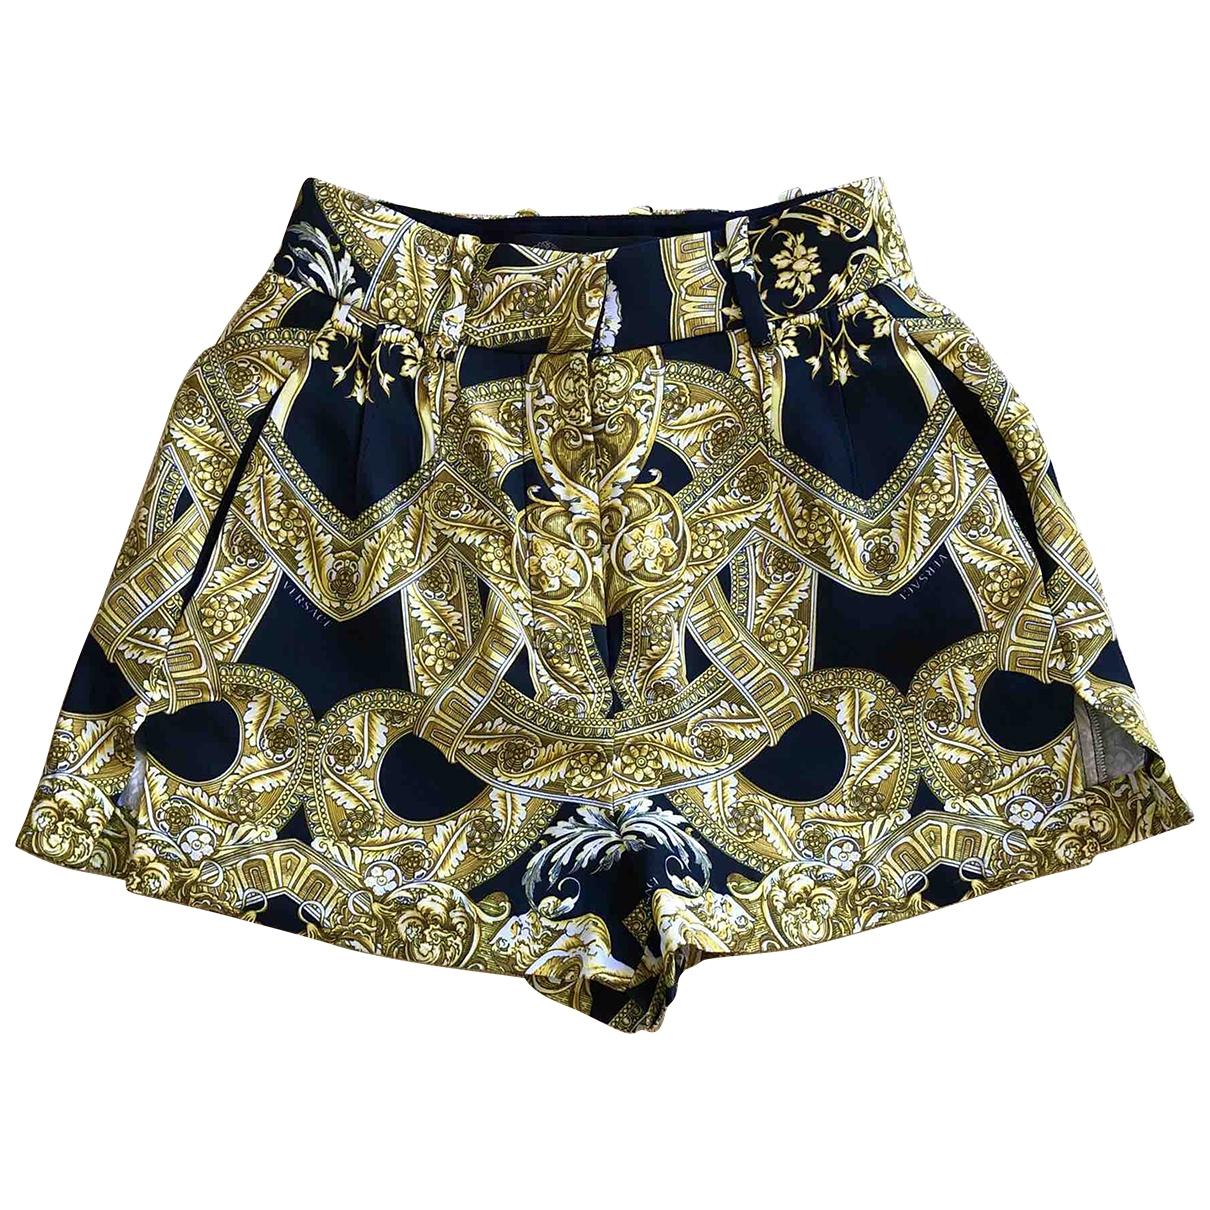 Versace N Multicolour Silk Shorts for Women